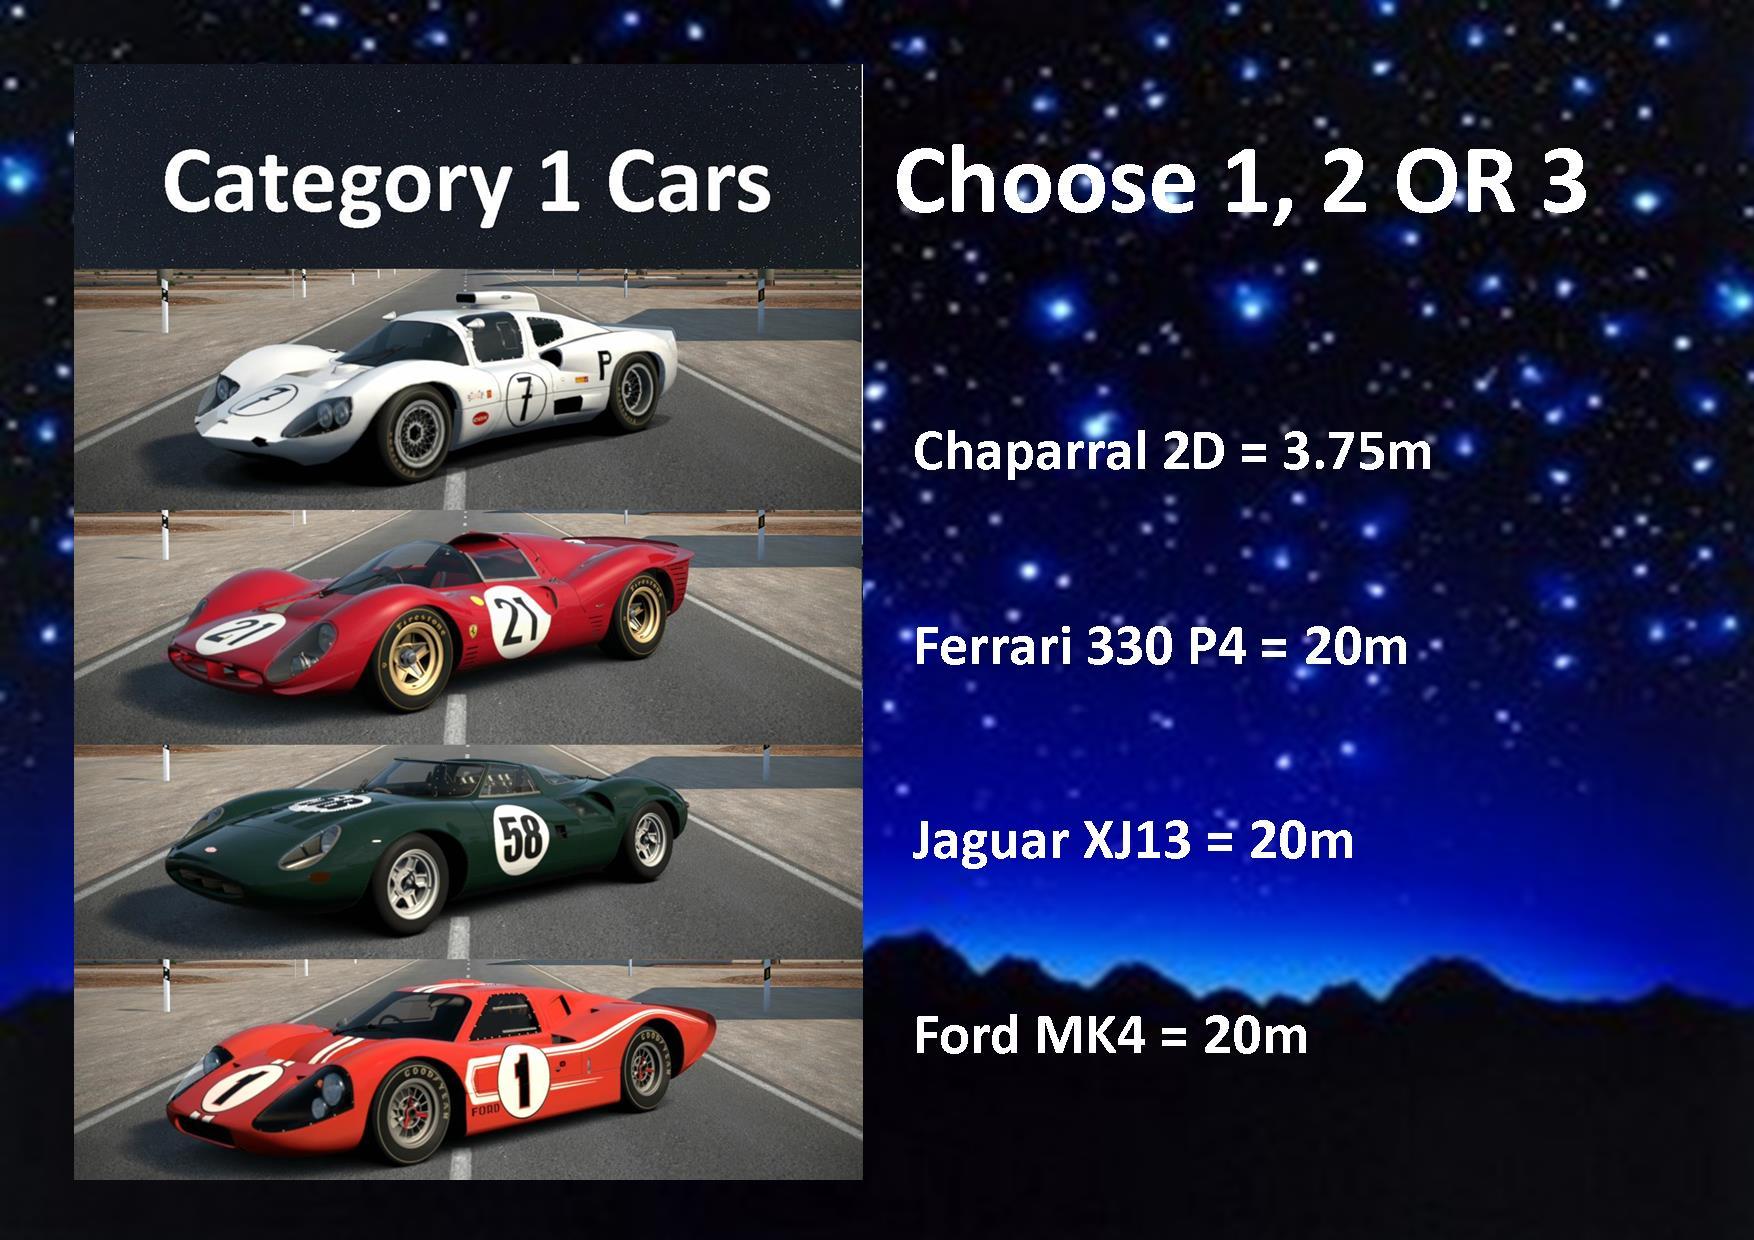 Category 1 Cars Final 4.jpg